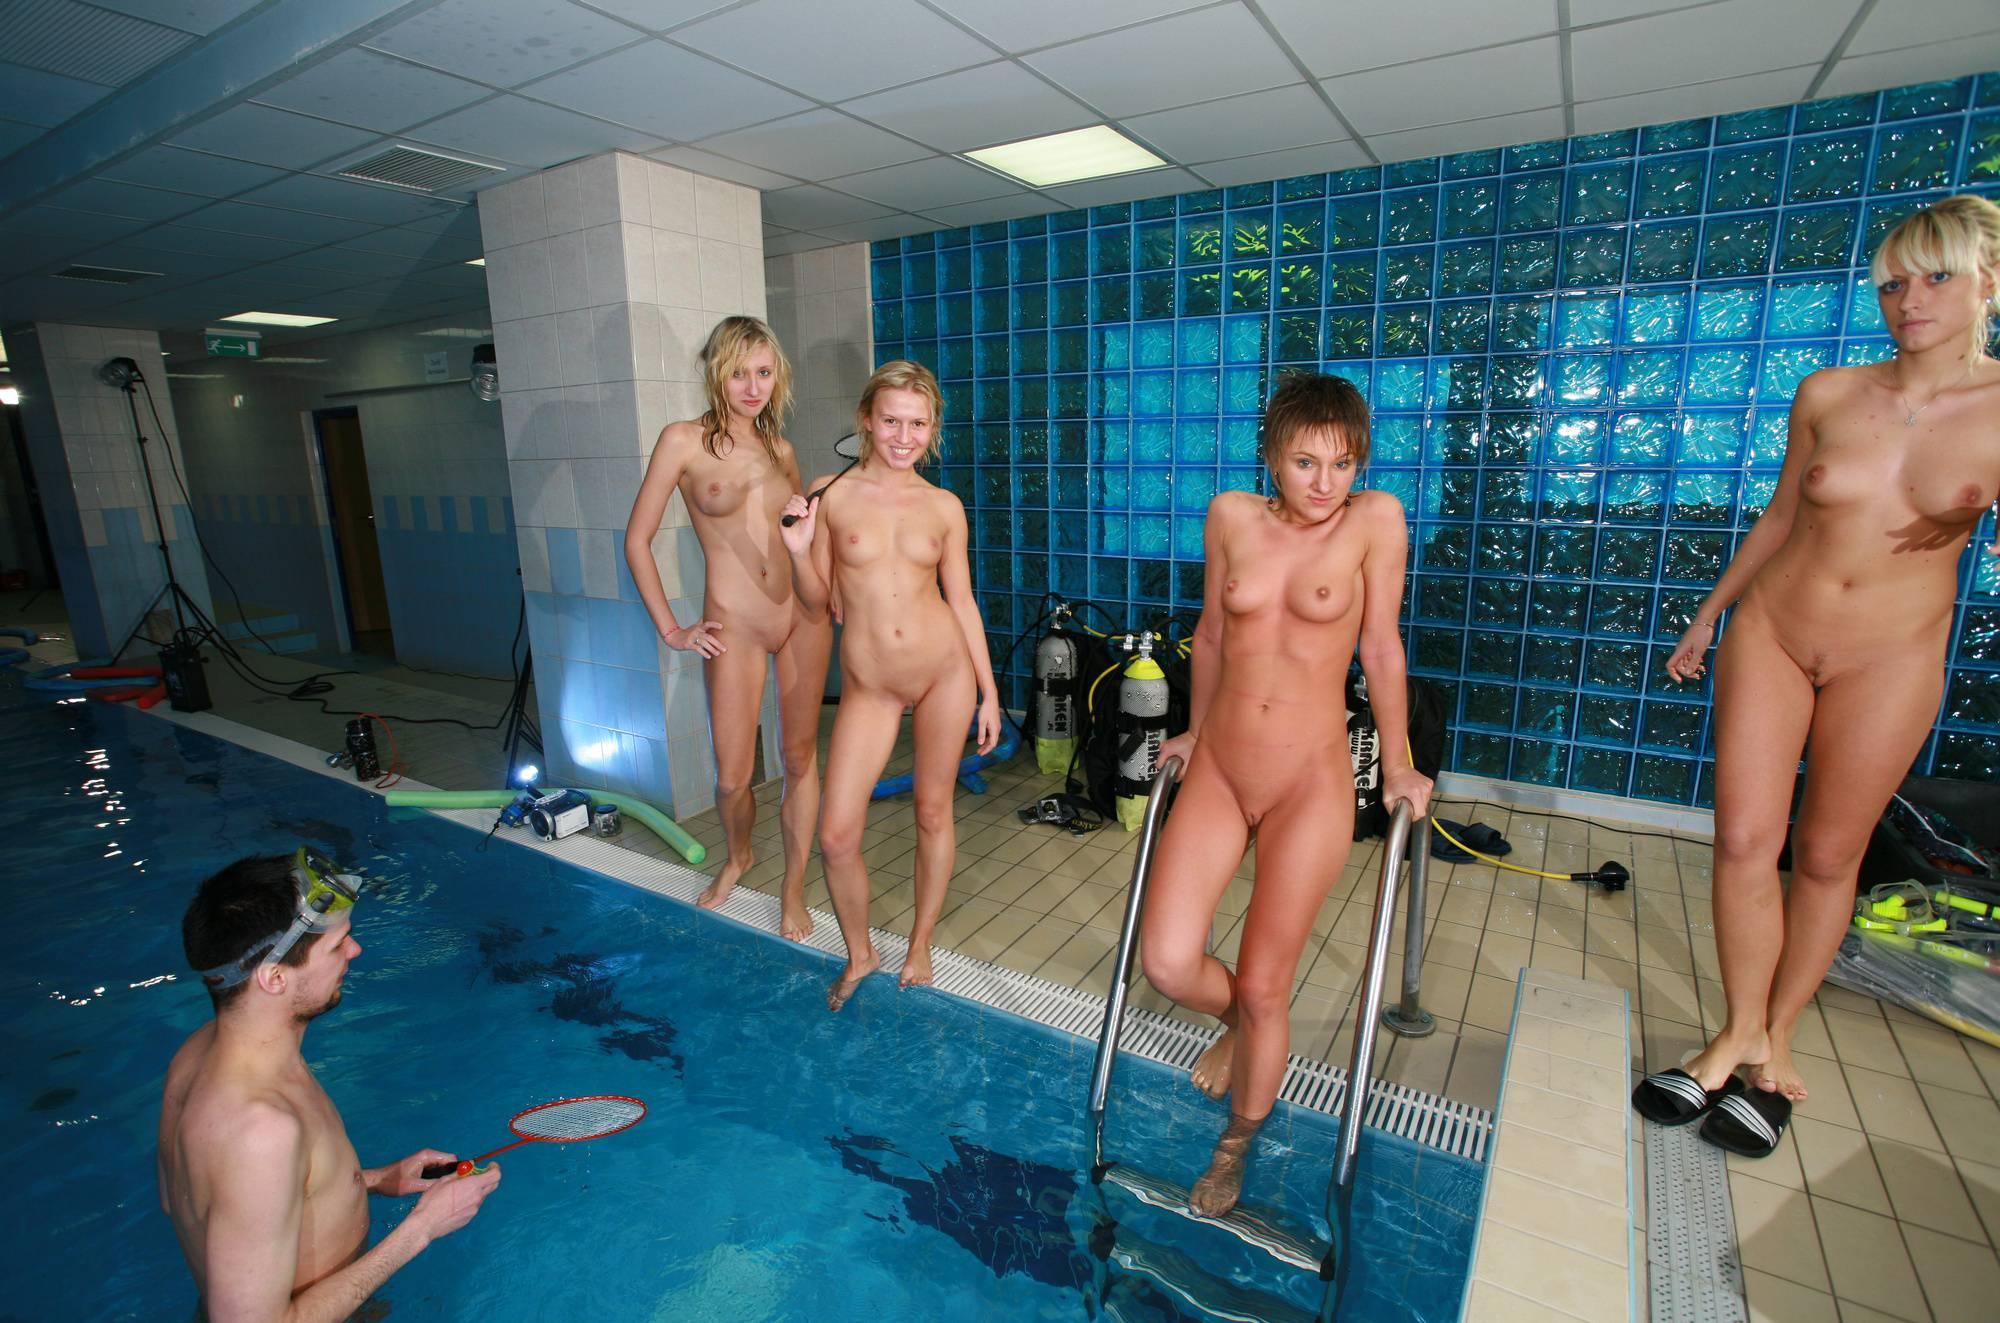 Scuba Gym Pool Play - 2